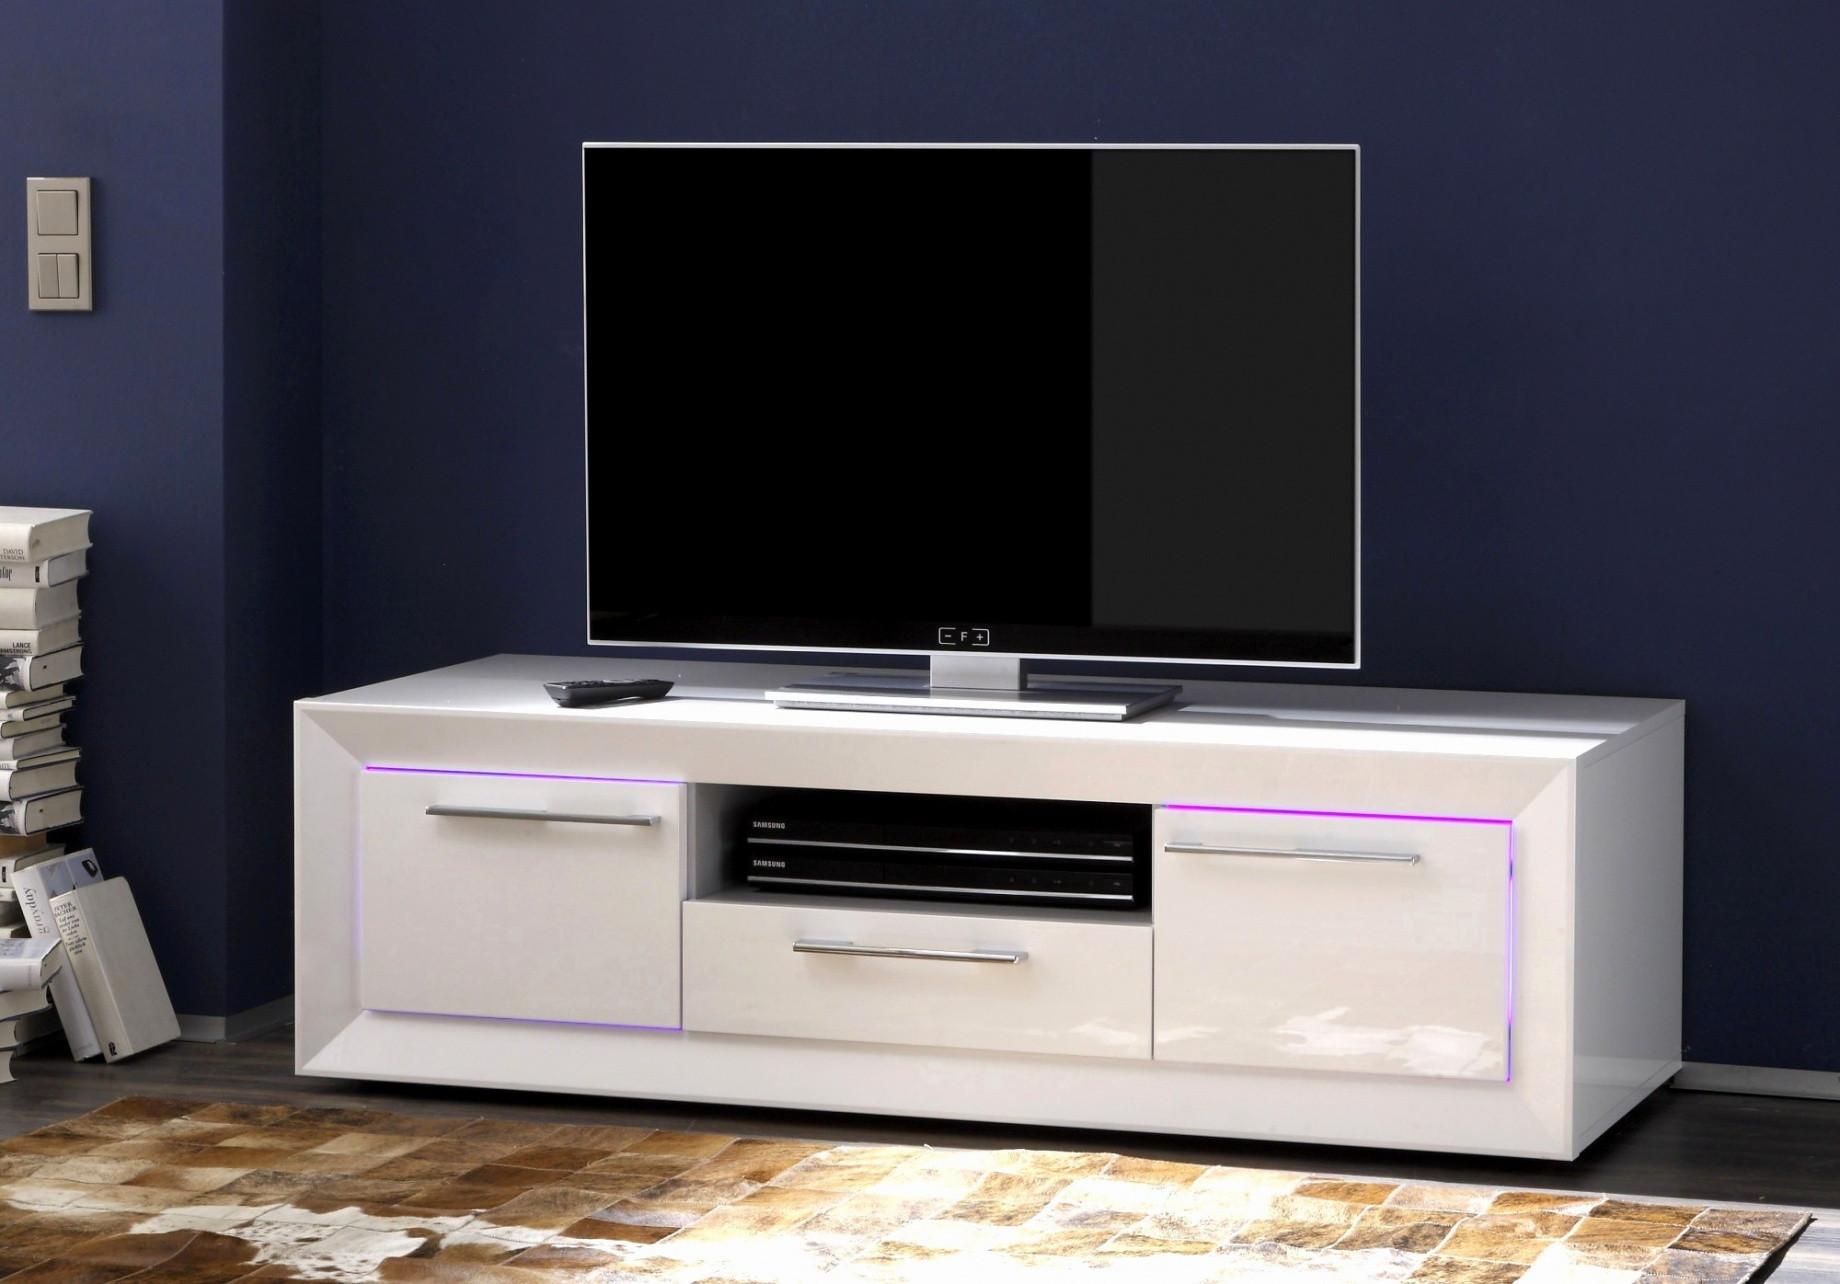 meuble tv angle meuble tv hifi meuble tv bois origins meuble 0d trad hus opinion de of meuble tv angle